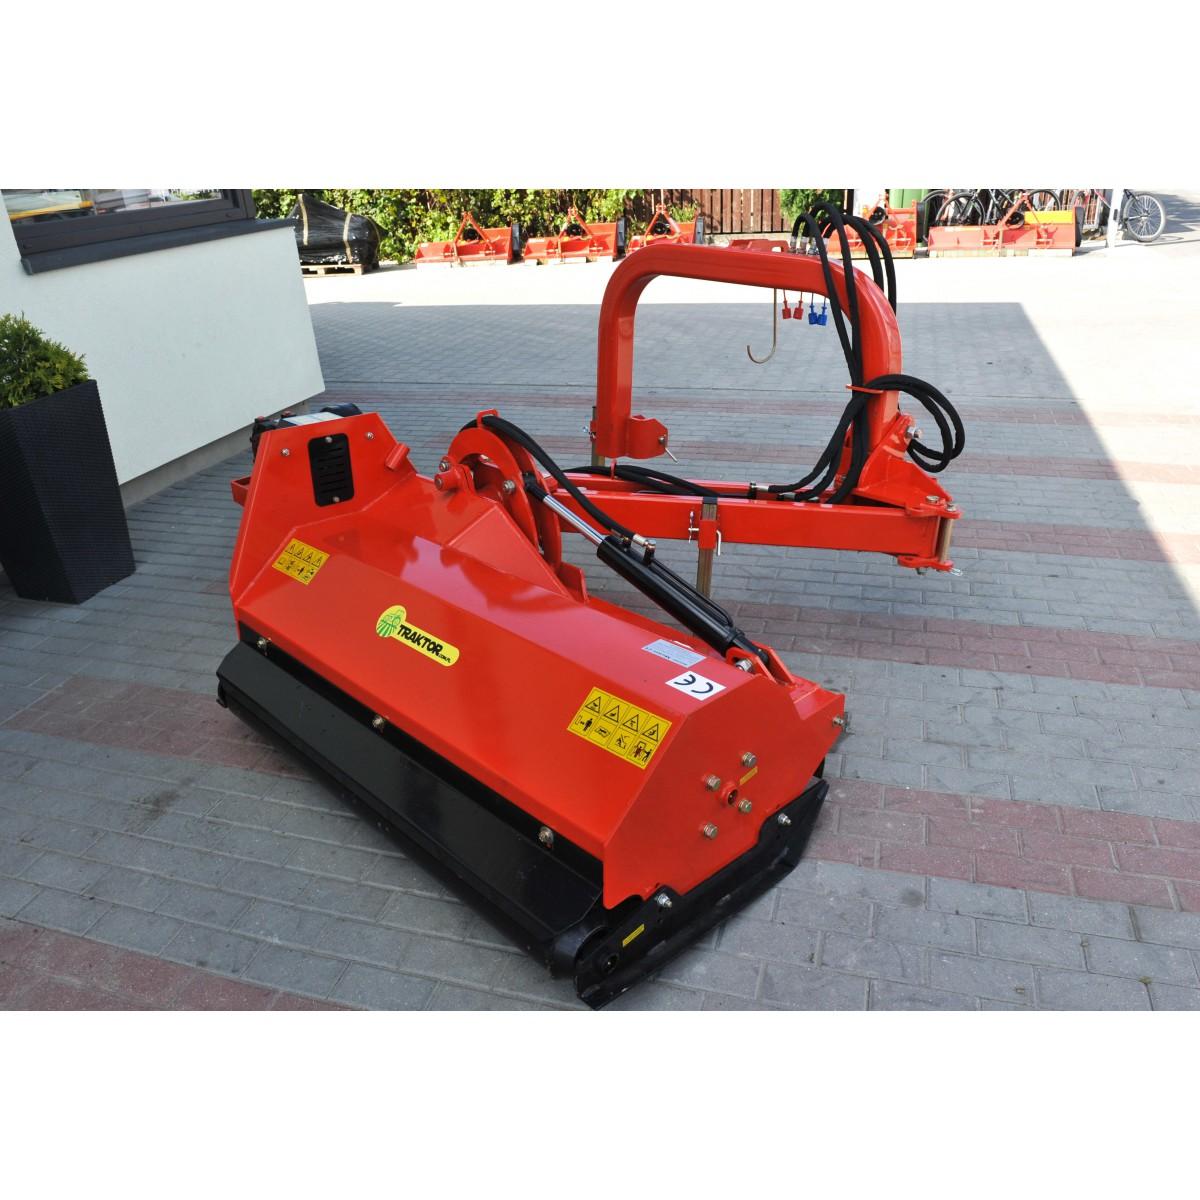 AGH 200 REAR-SIDE Flail Mower